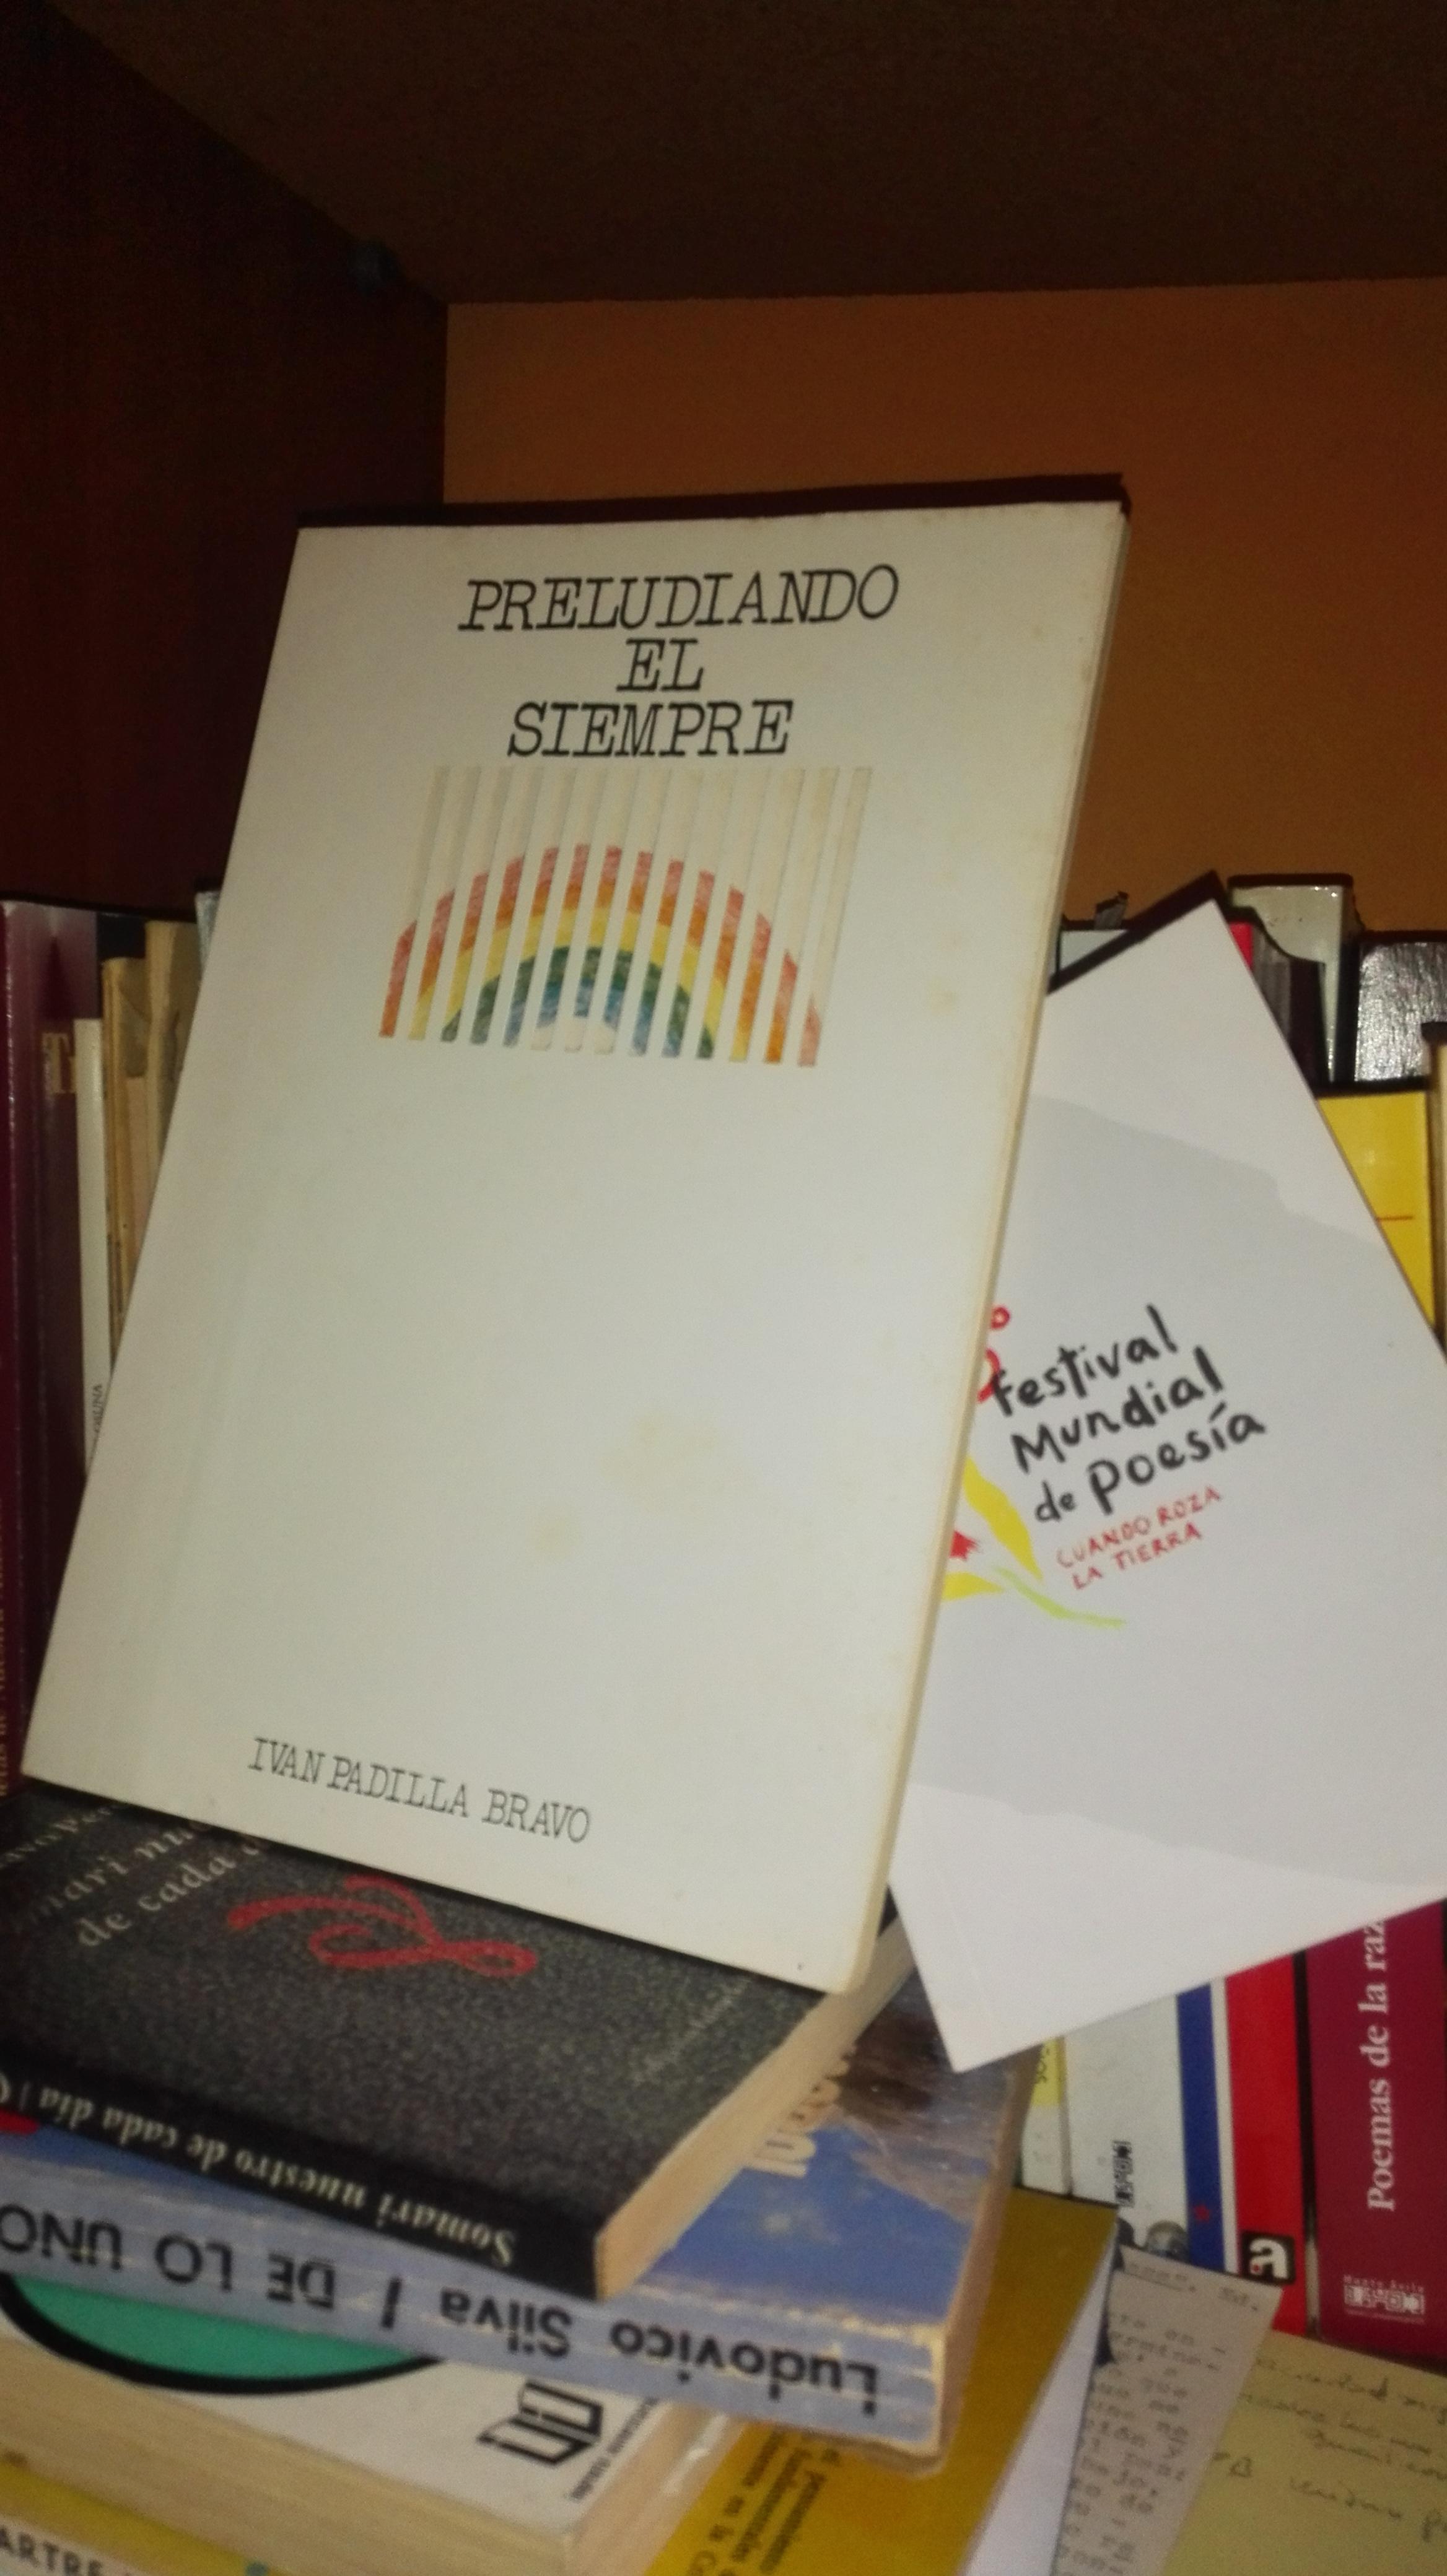 Volver a ser poesía – PorIván Padilla Bravo